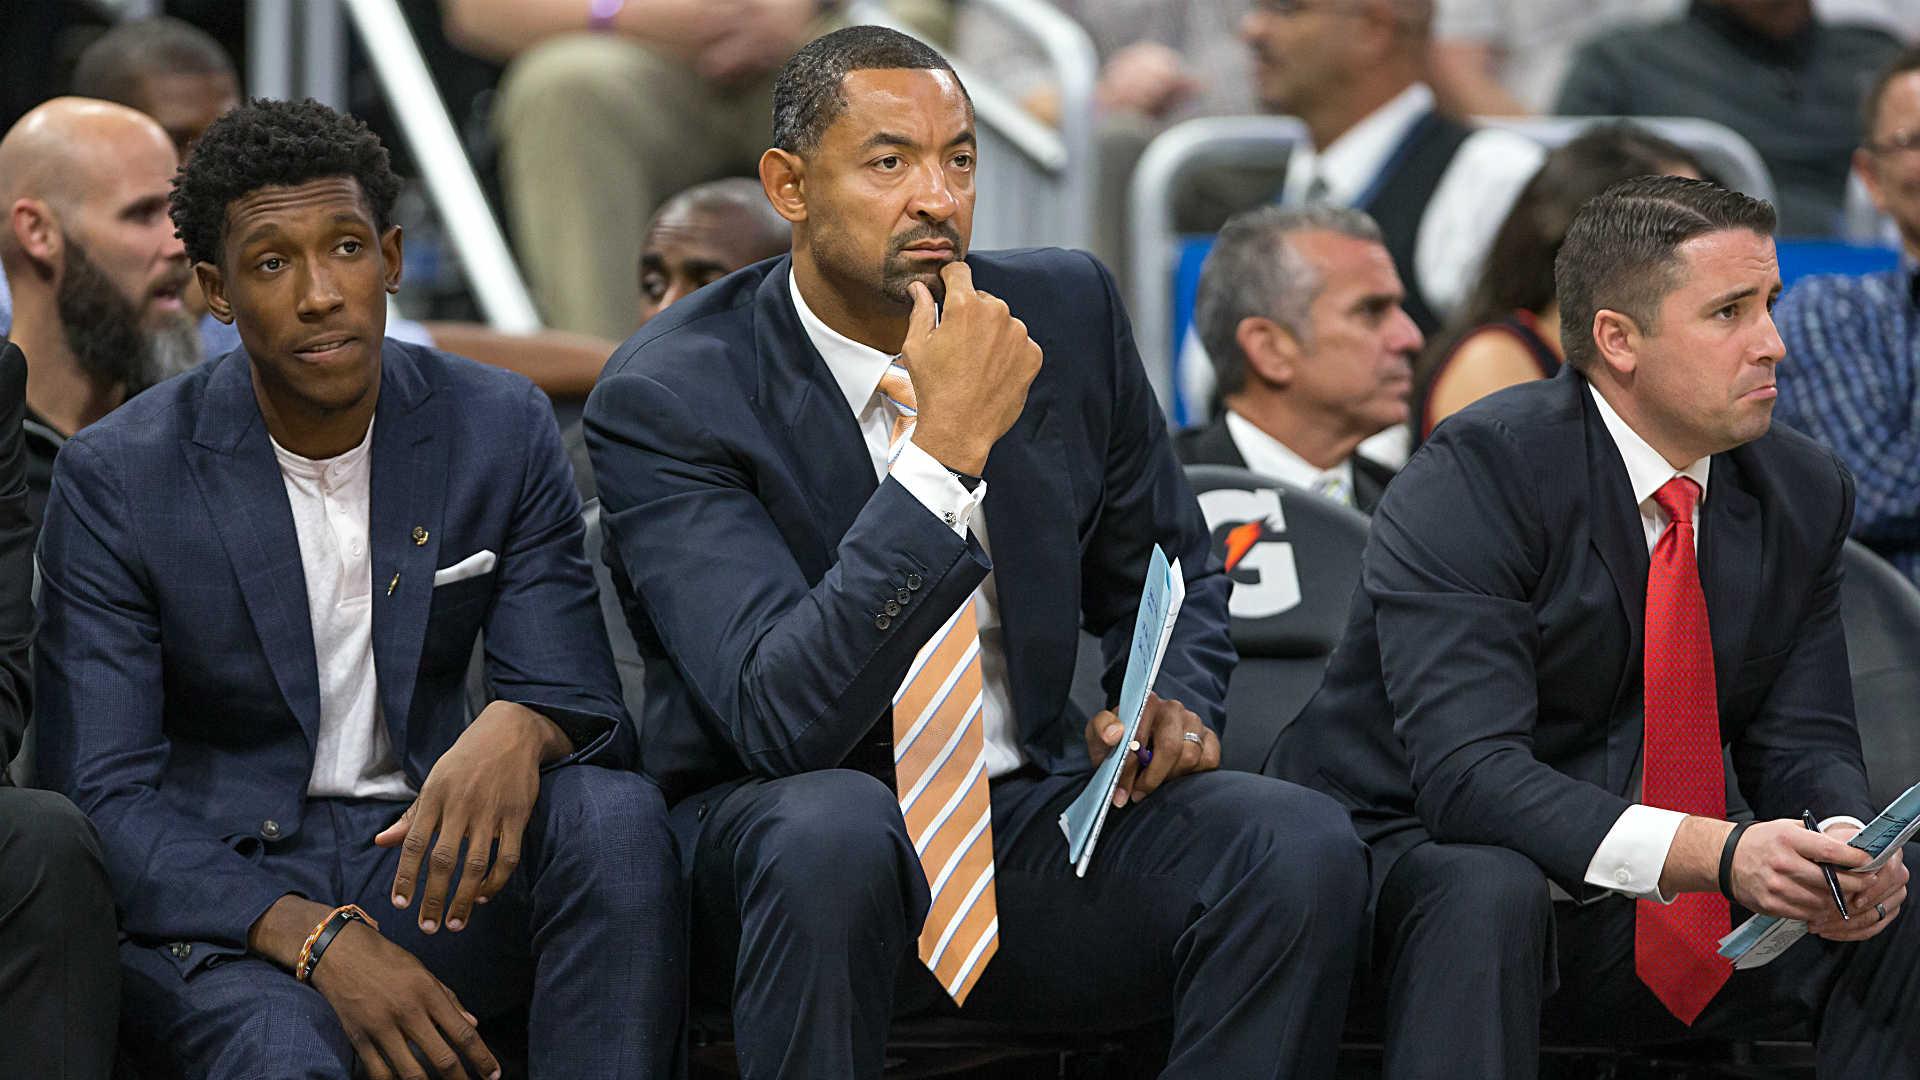 Fab Five nostalgia aside, Juwan Howard hire hinges on Michigan's next basketball culture